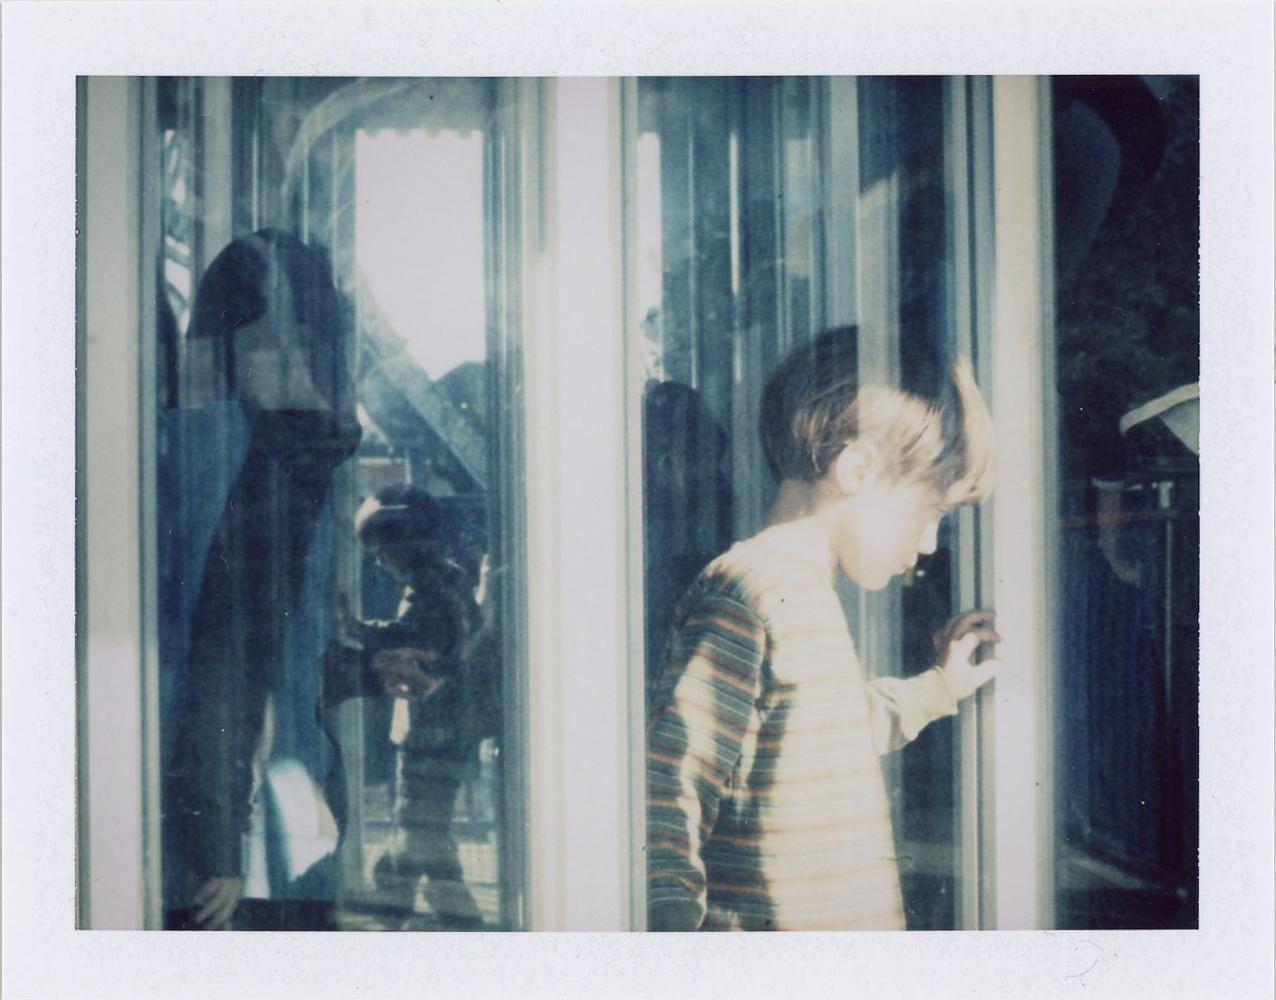 Avery / House of Mirrors, Salem, 2017